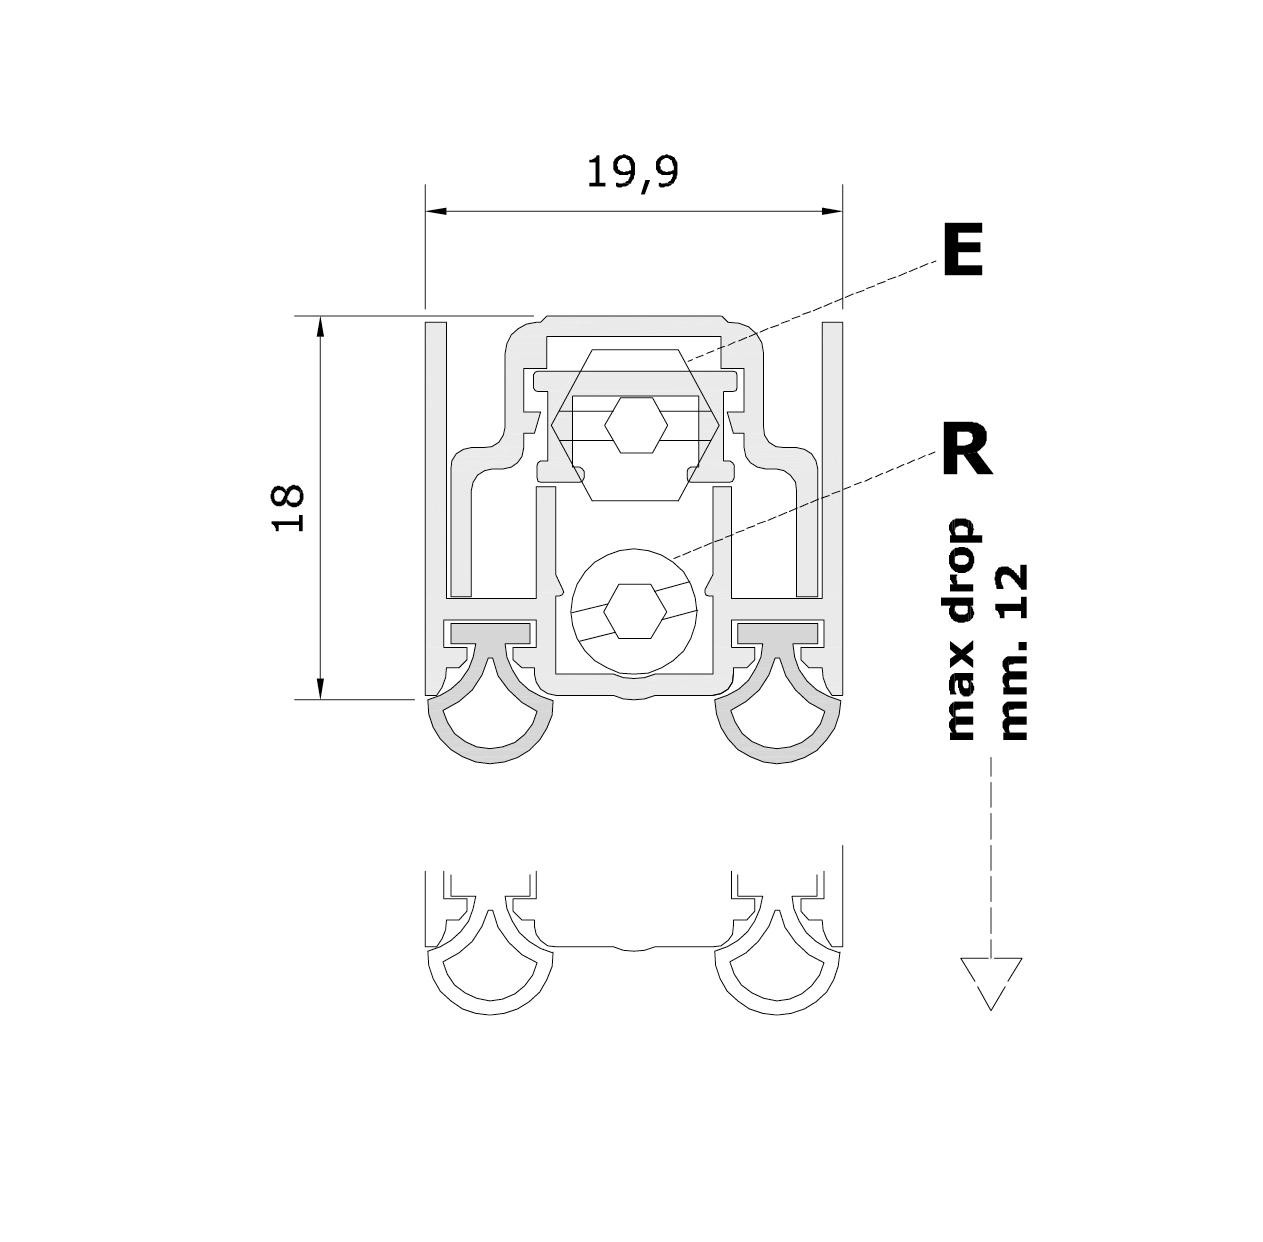 Misure standard (mm) per il paraspifferi Serie Special 1300